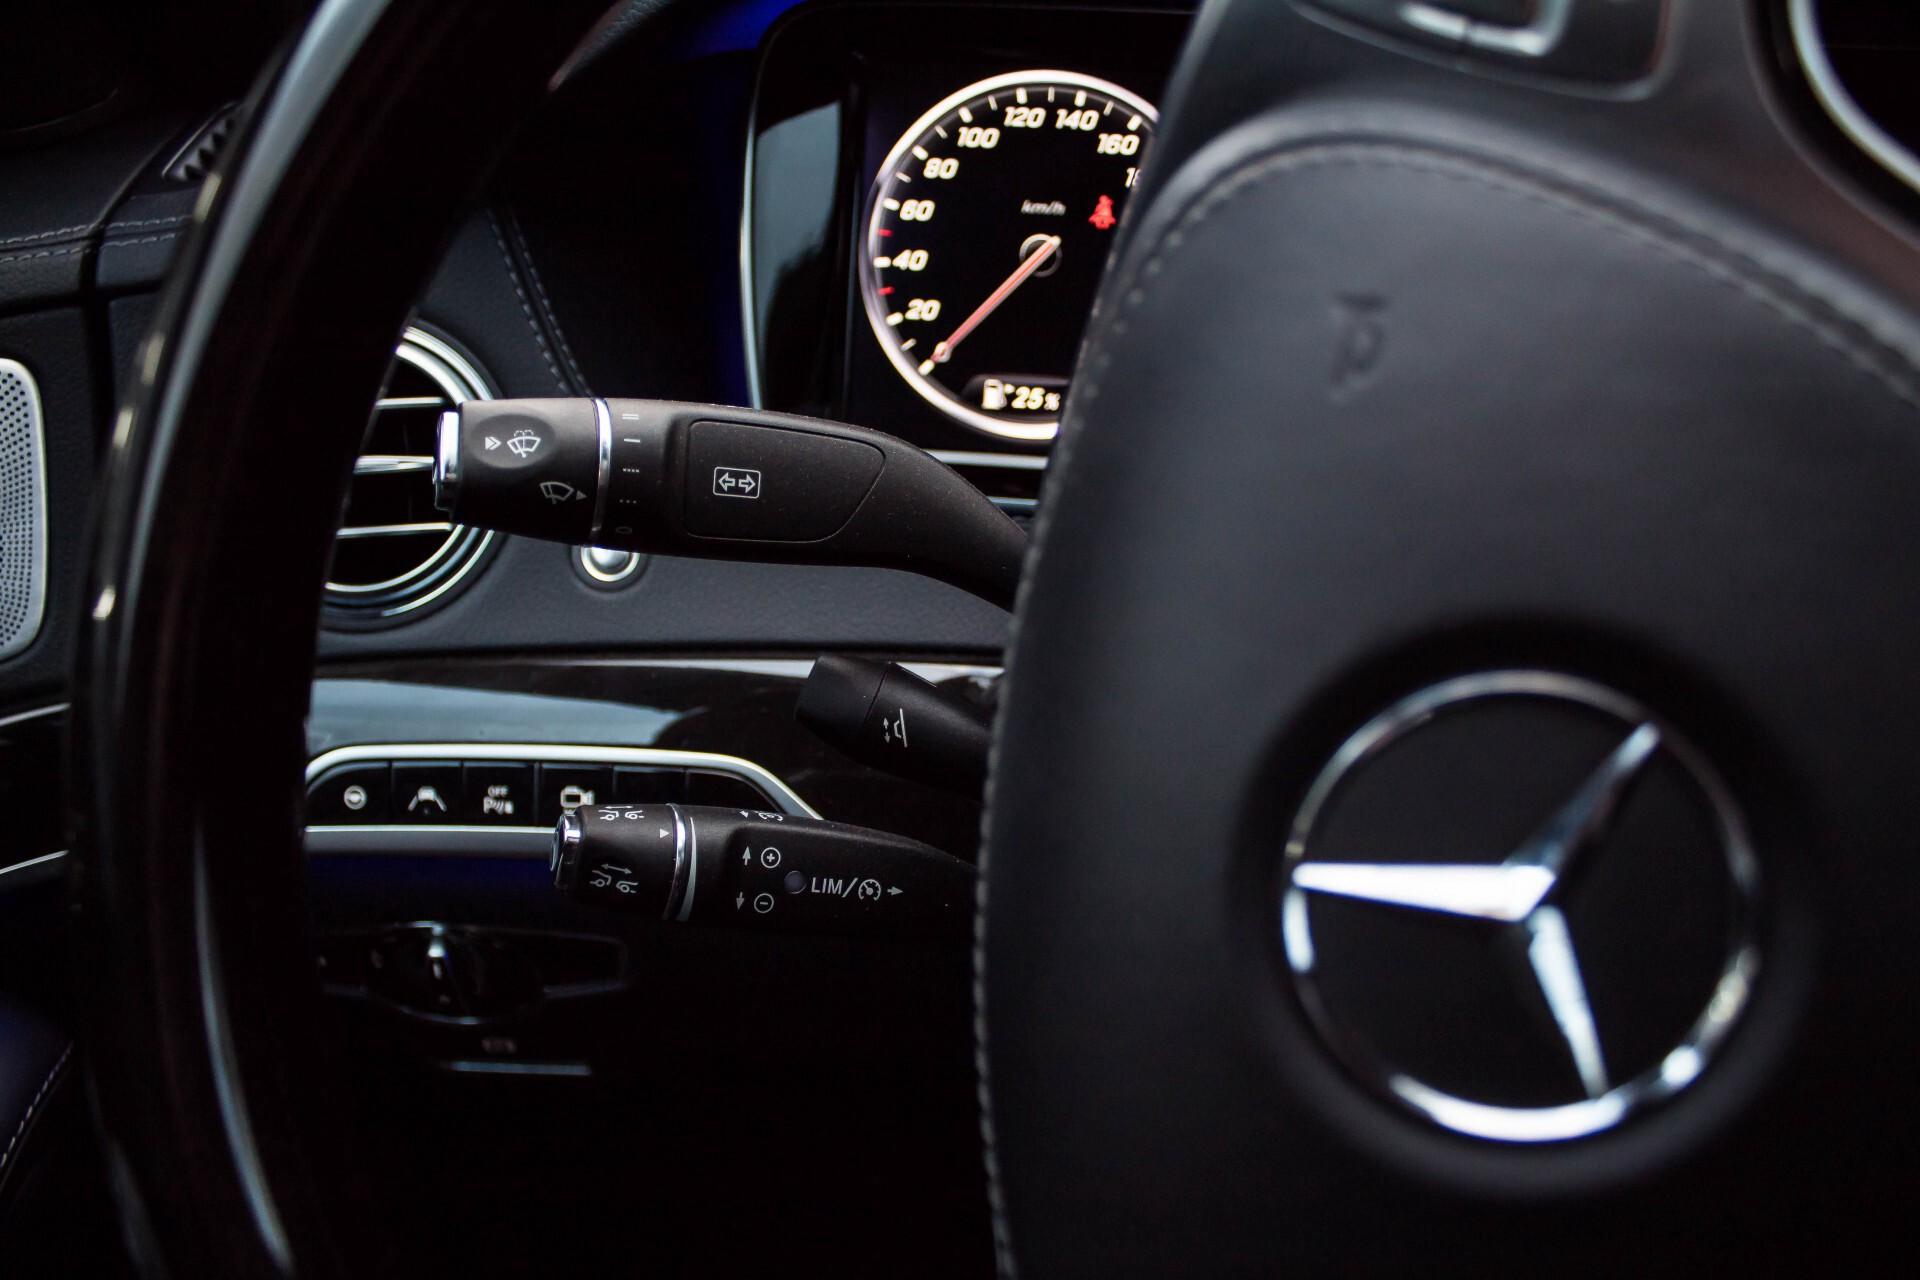 Mercedes-Benz S-Klasse 350 BlueTEC 63 AMG Panorama/Distronic/Keyless/Massage/Burmester Aut7 Foto 14